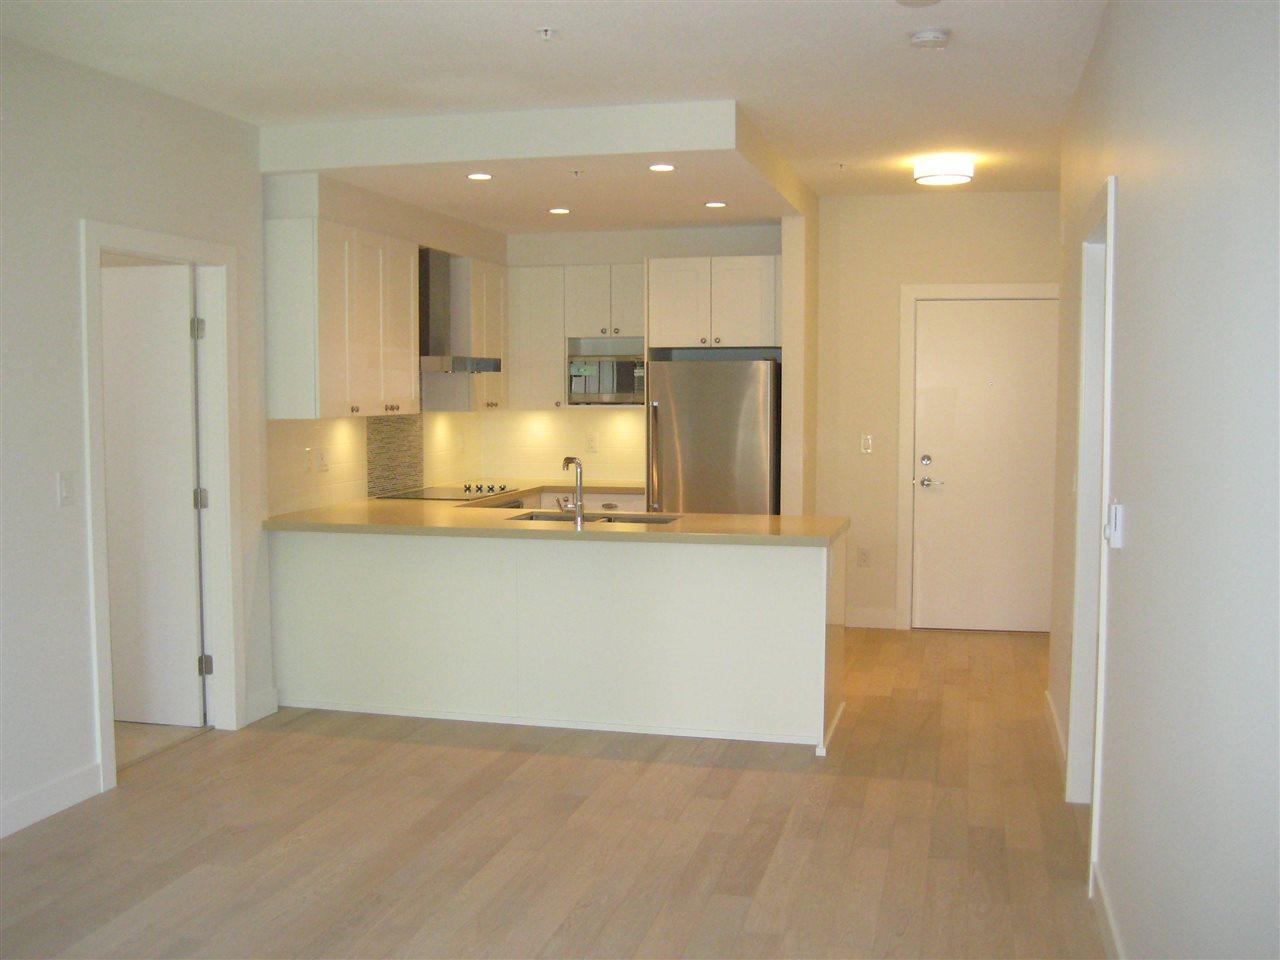 Condo Apartment at 325 3399 NOEL DRIVE, Unit 325, Burnaby North, British Columbia. Image 3